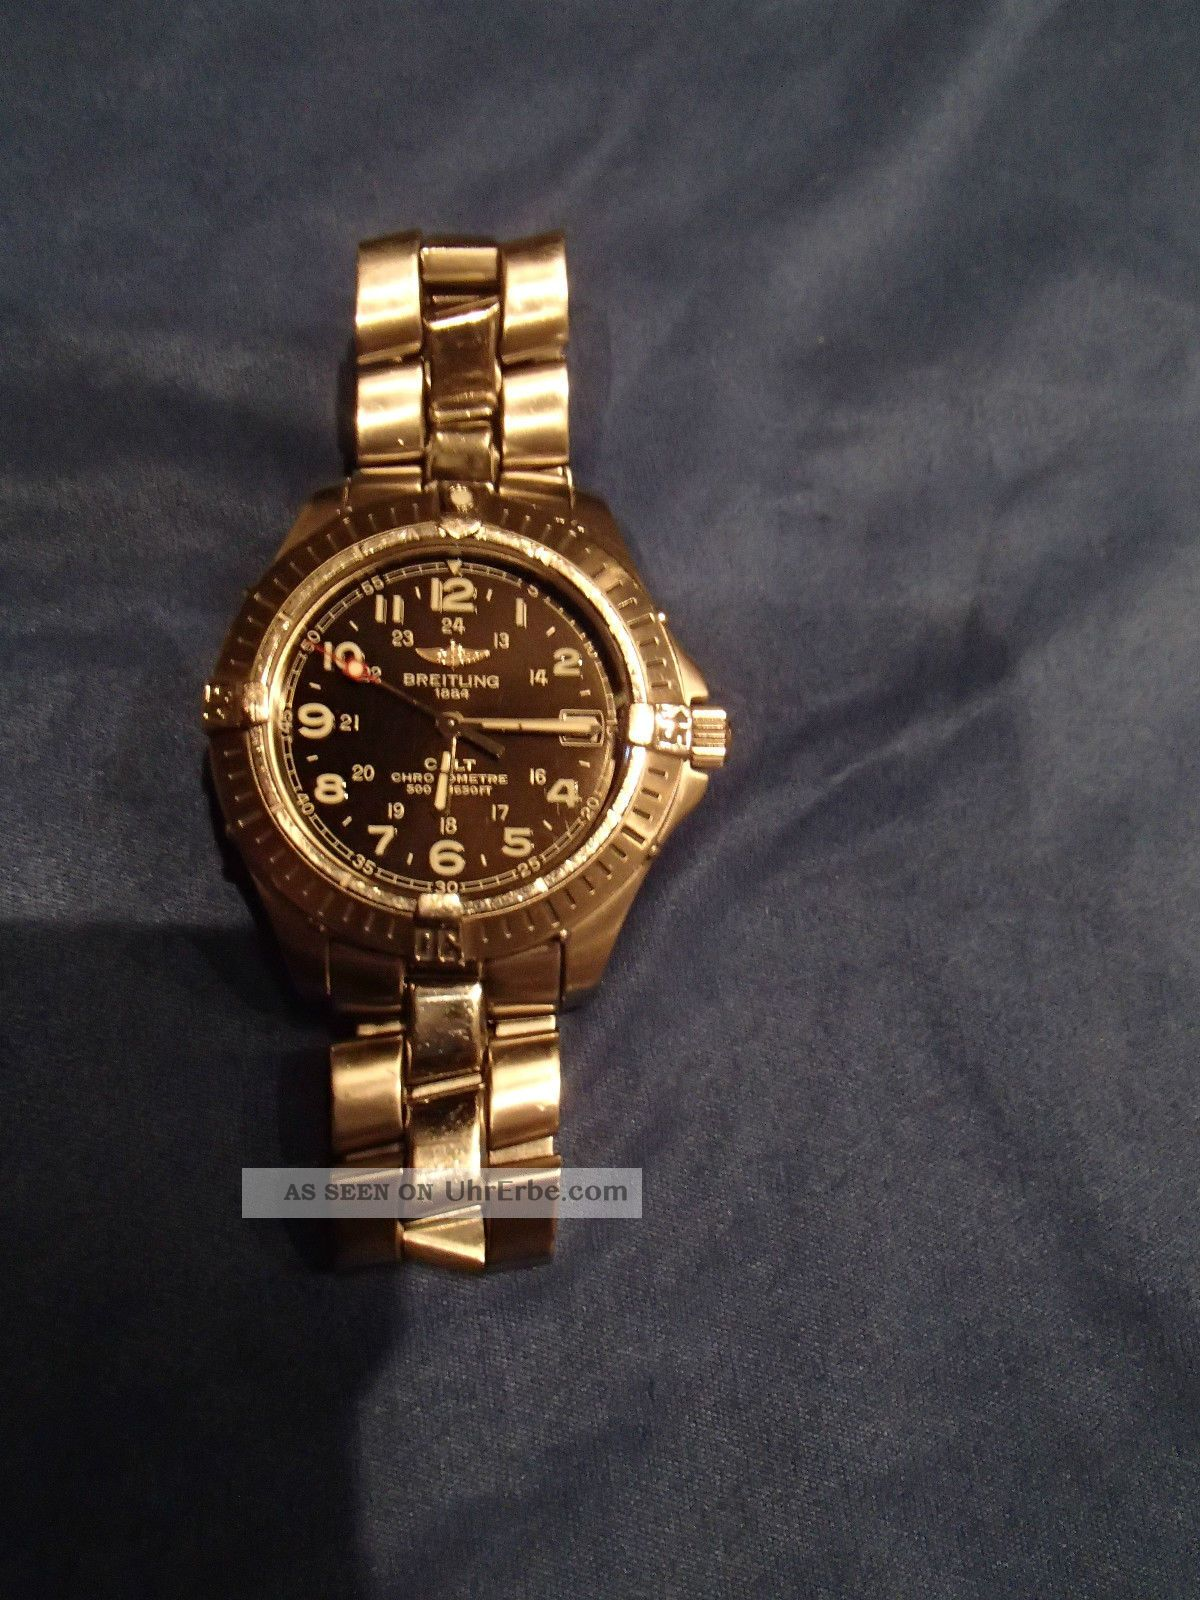 Breitling Colt Chronometre Quartz Schwarz Stahlarmband Armbanduhren Bild